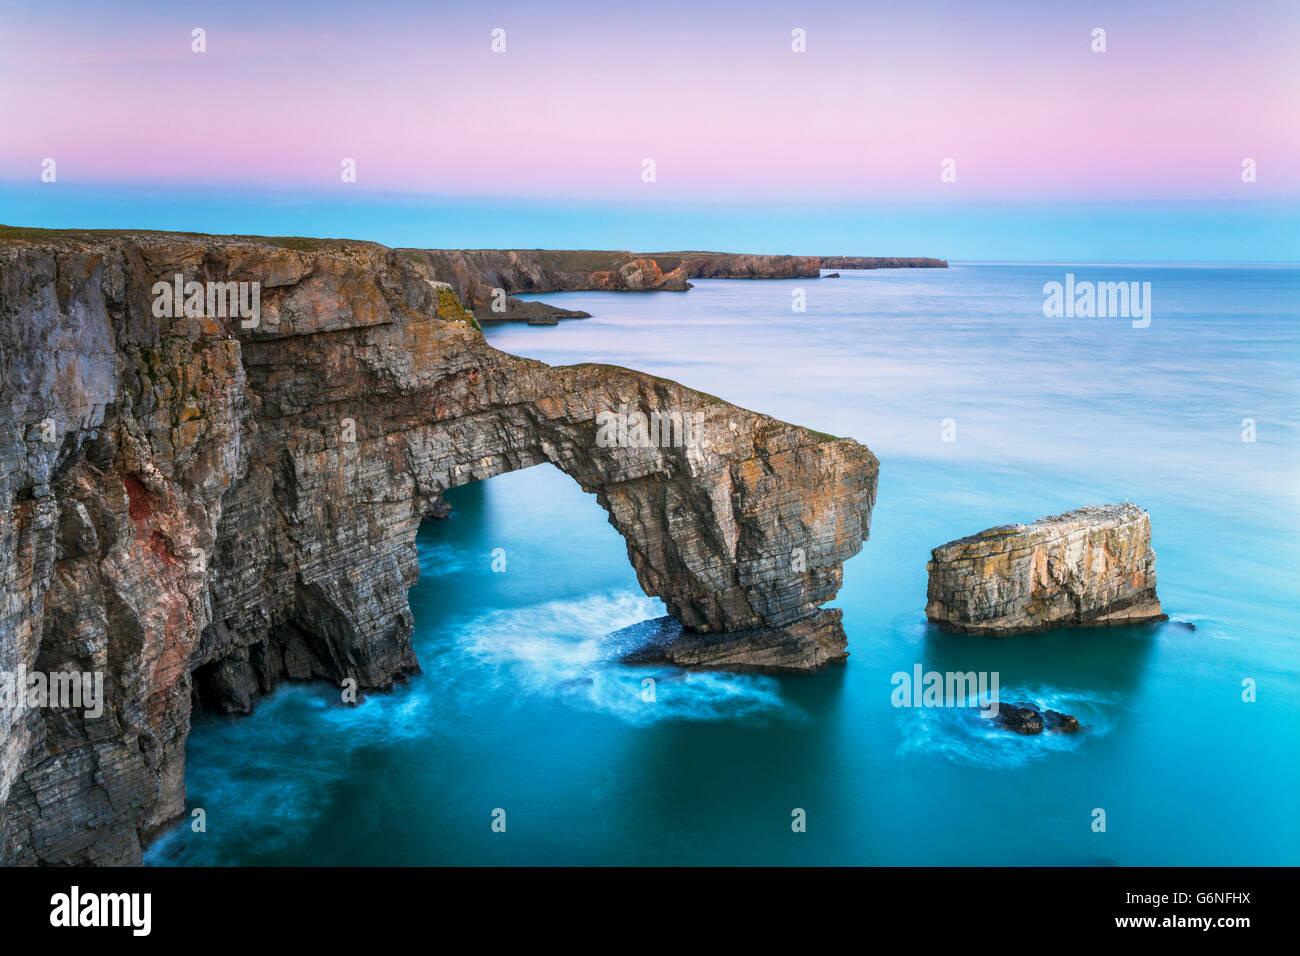 Green Bridge of  Wales,  Pembrokeshire Coast, Wales, U.K. - Stock Image